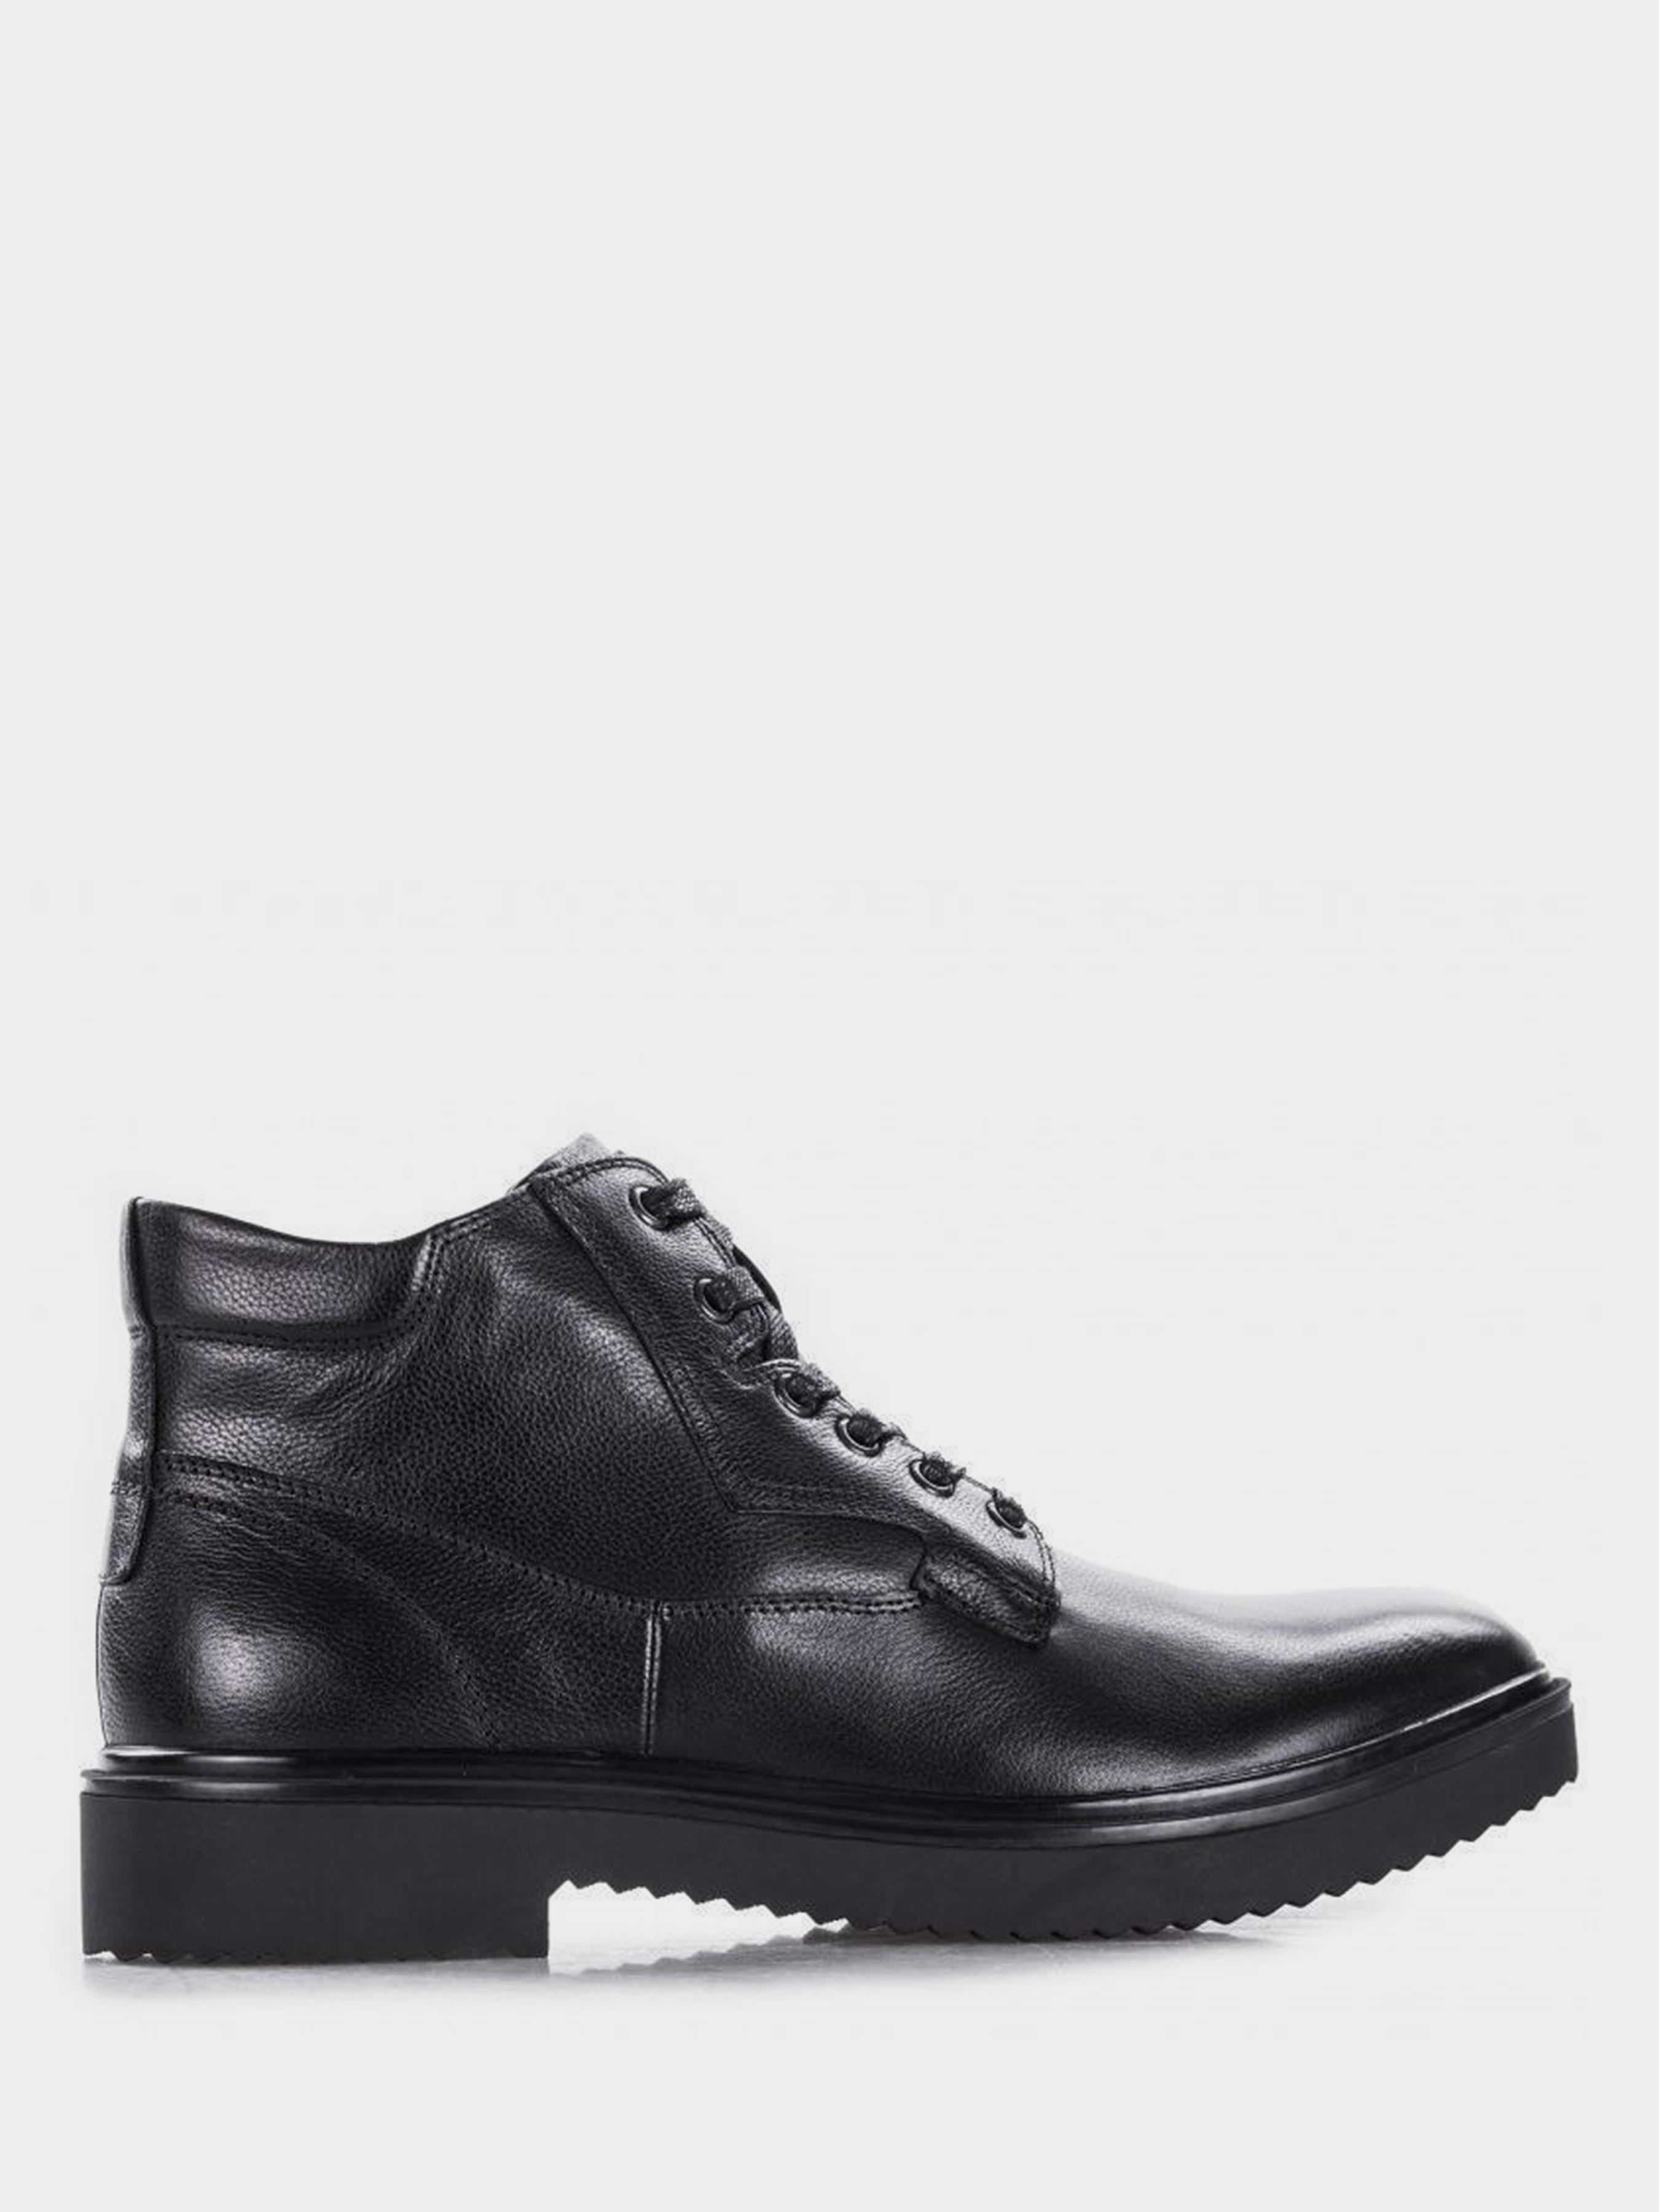 Ботинки для мужчин Braska BR1560 брендовые, 2017